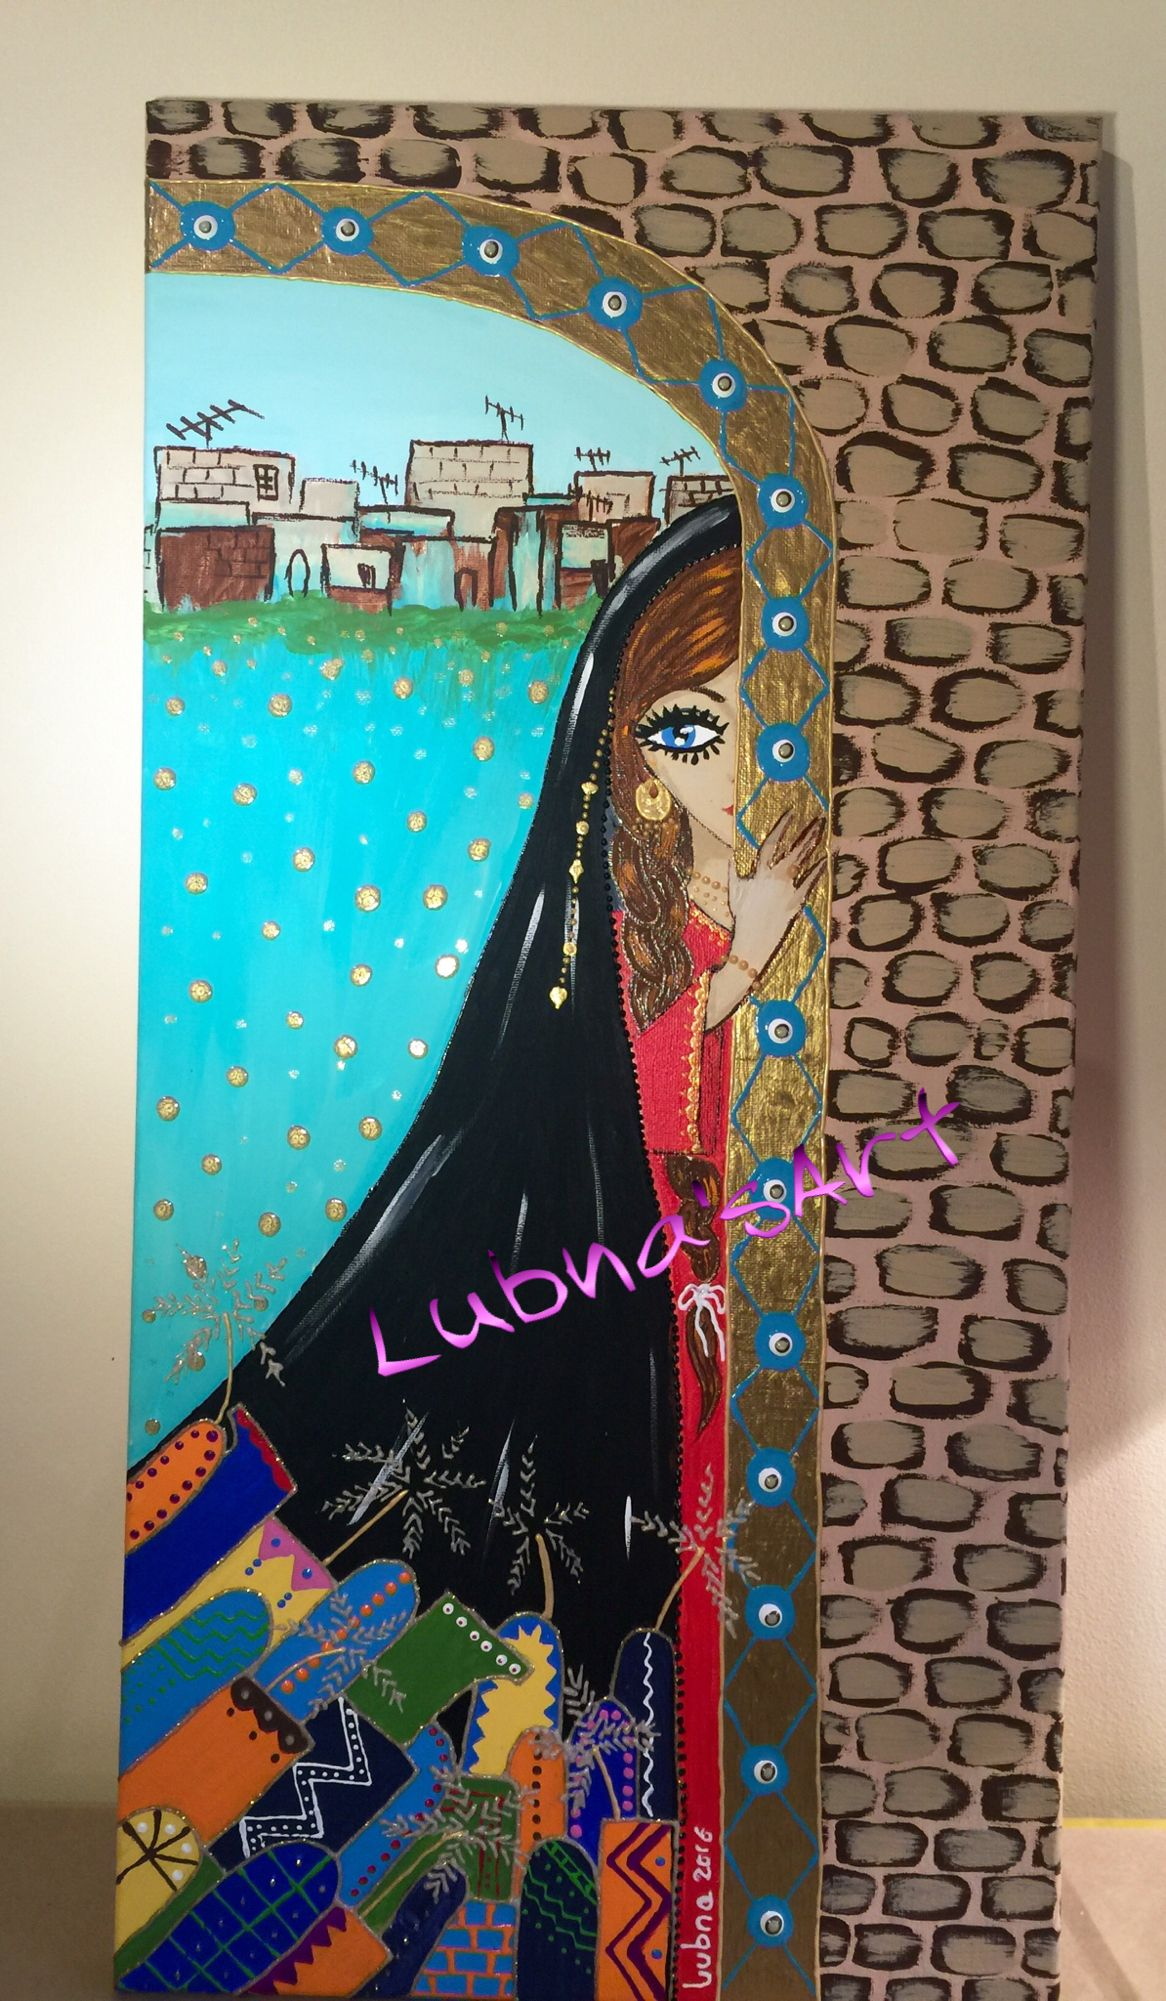 Pin By Fateme Darvishi On Art Egyptian Art Islamic Art Middle Eastern Art